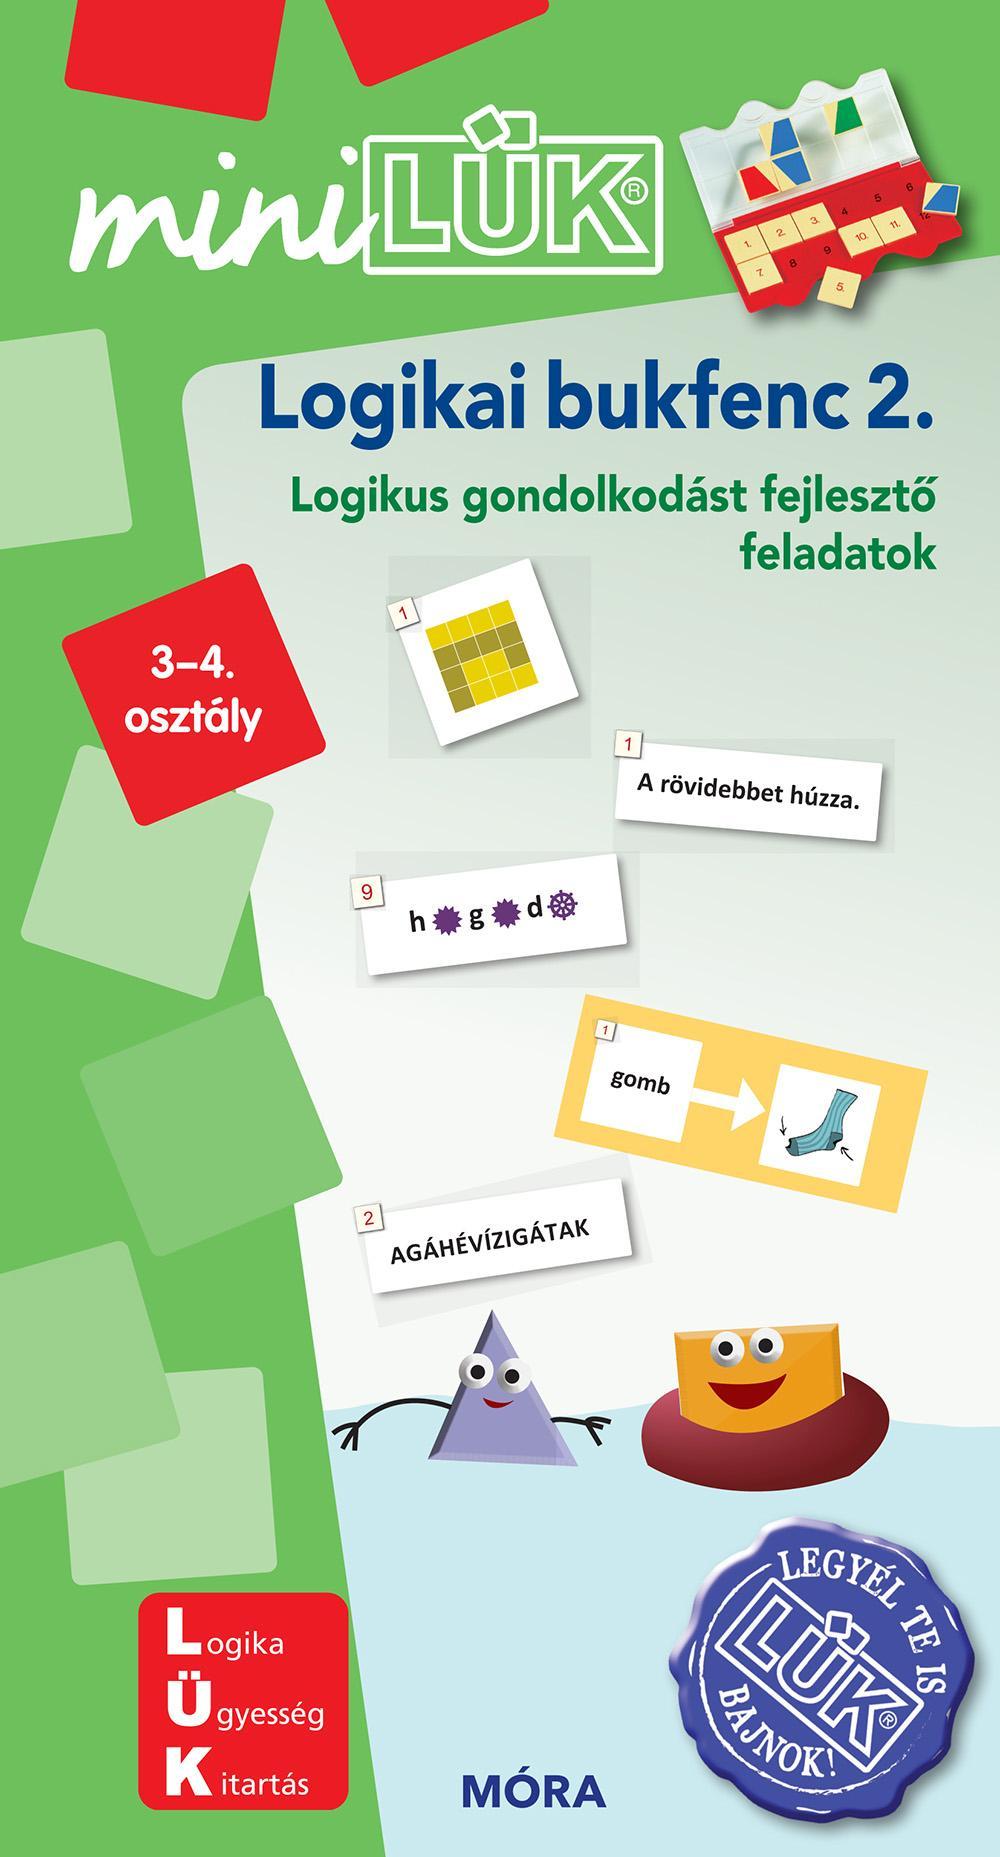 LOGIKAI BUKFENC 2. - MATEMATIKAI GONDOLKODÁST FEJLESZTÕ F. 3-4. O. - MINILÜK